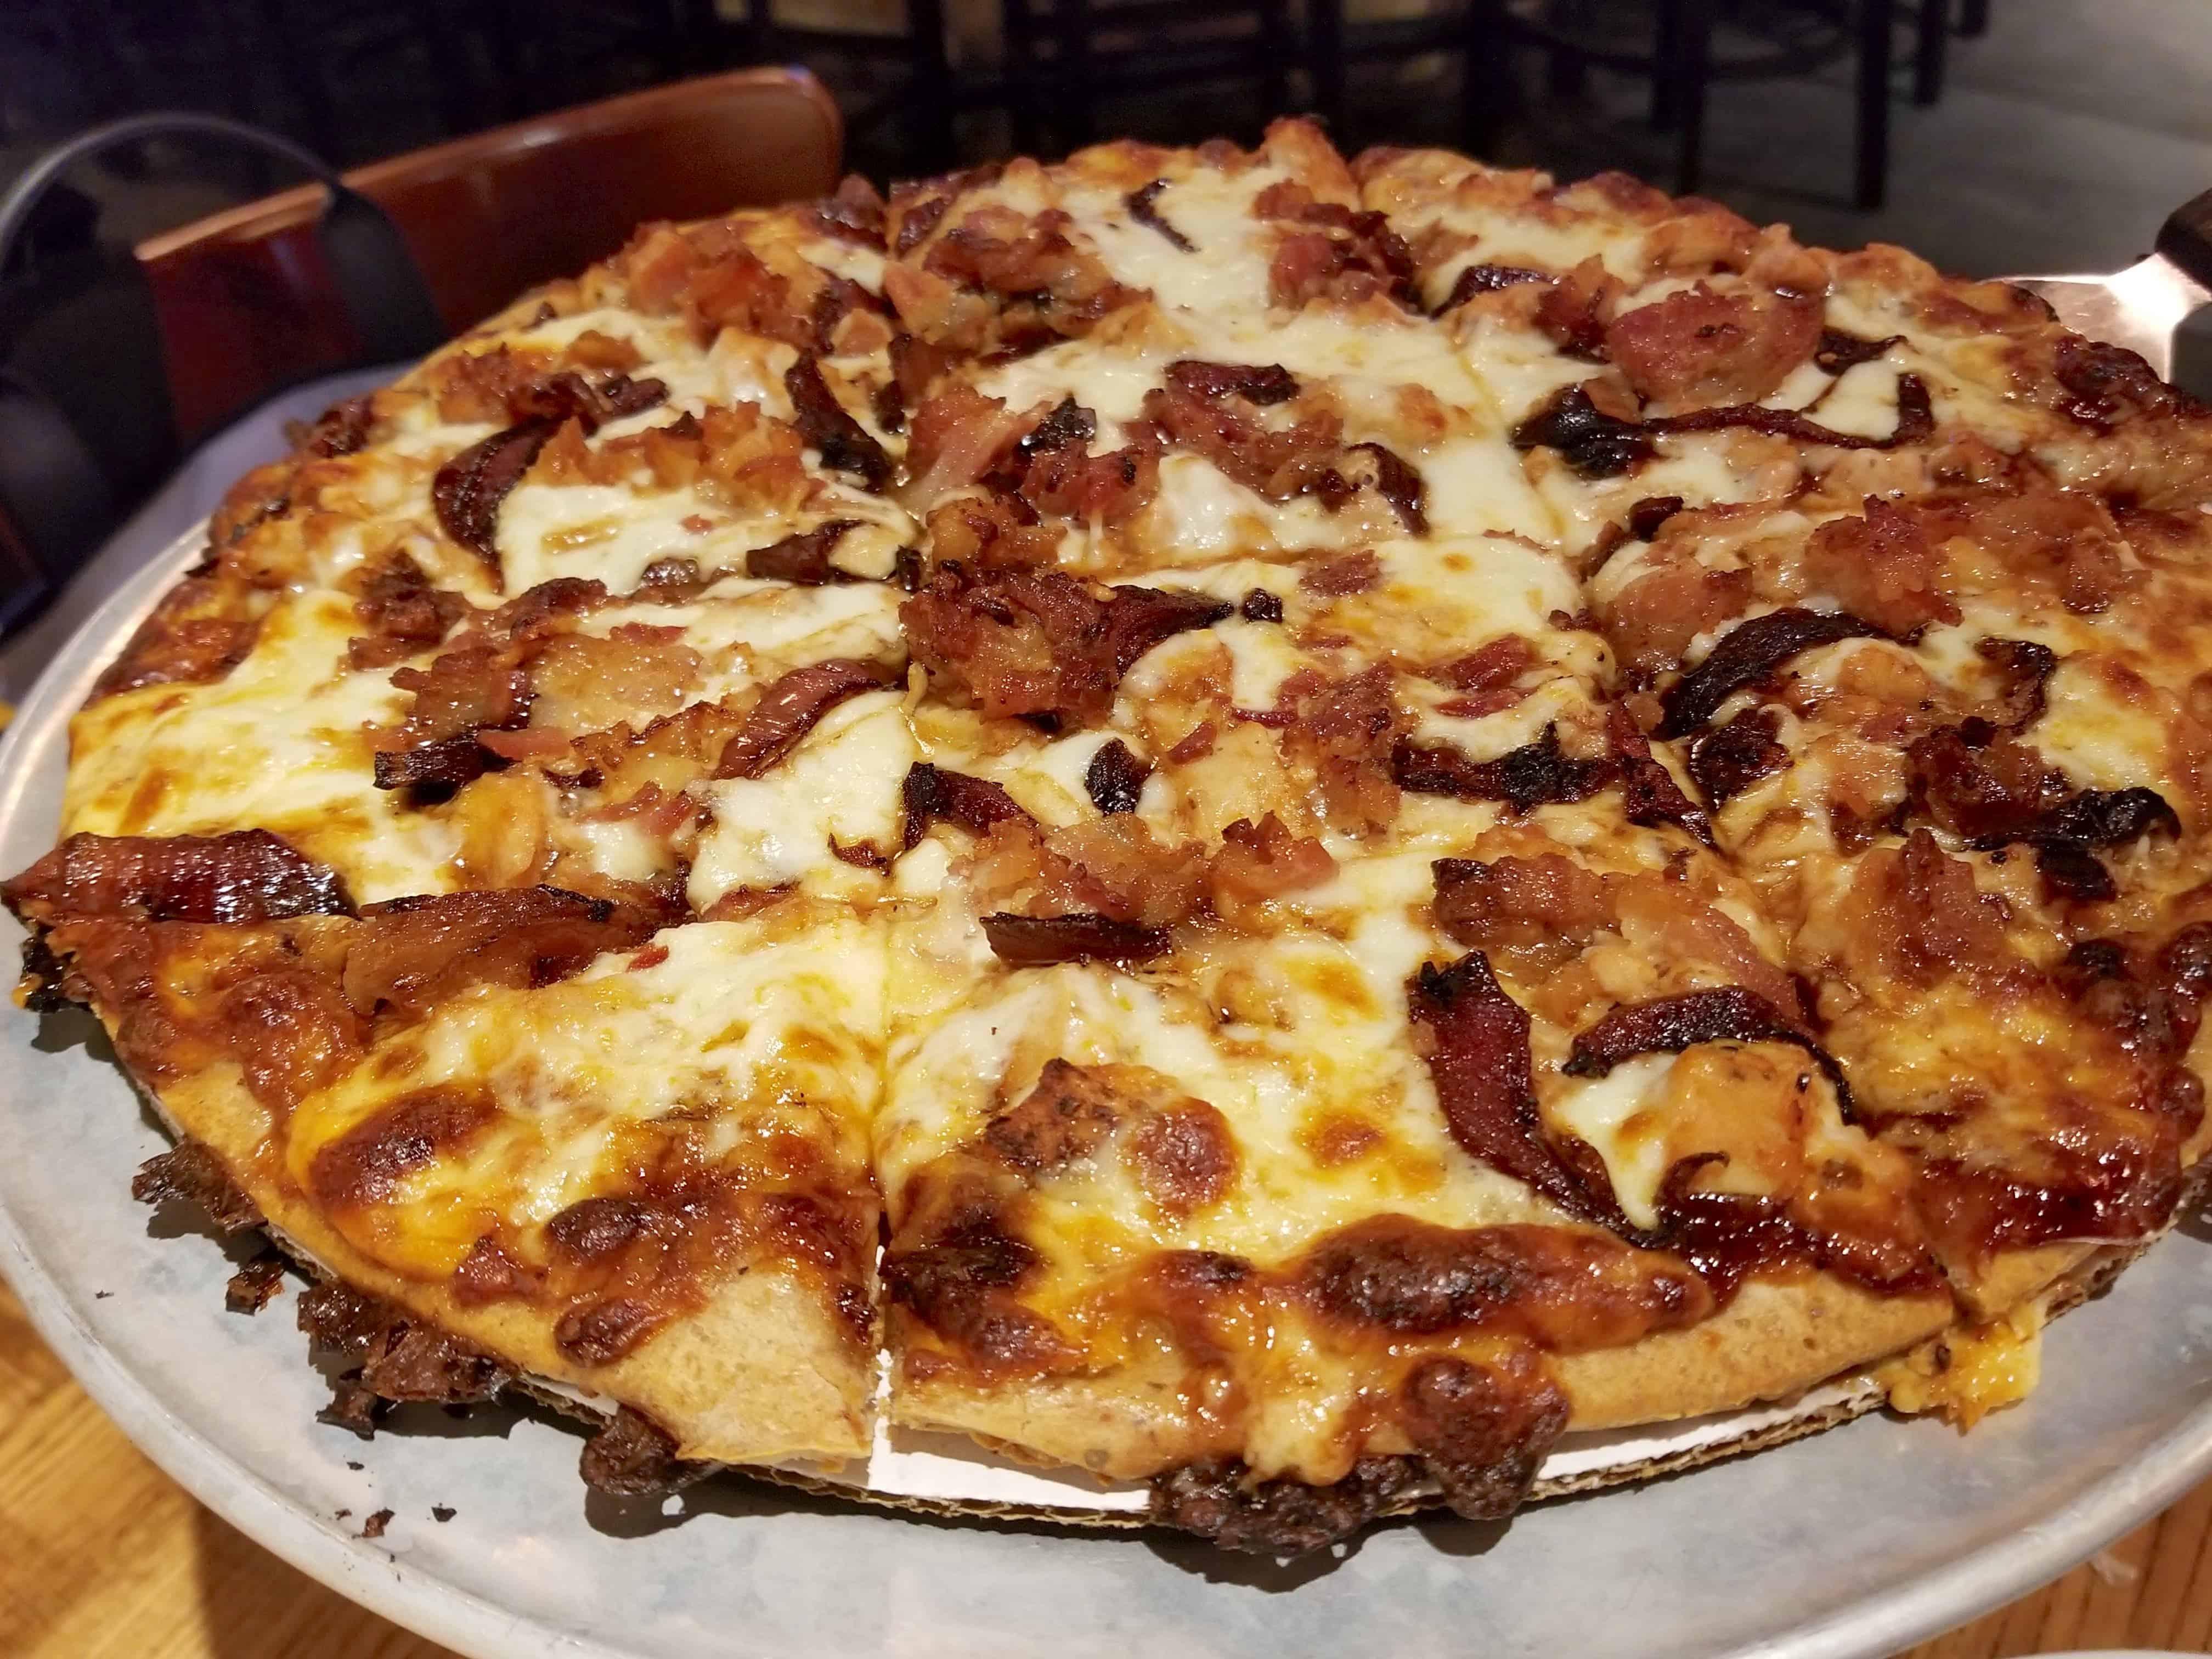 Gluten free pizza at Giordano's Detroit